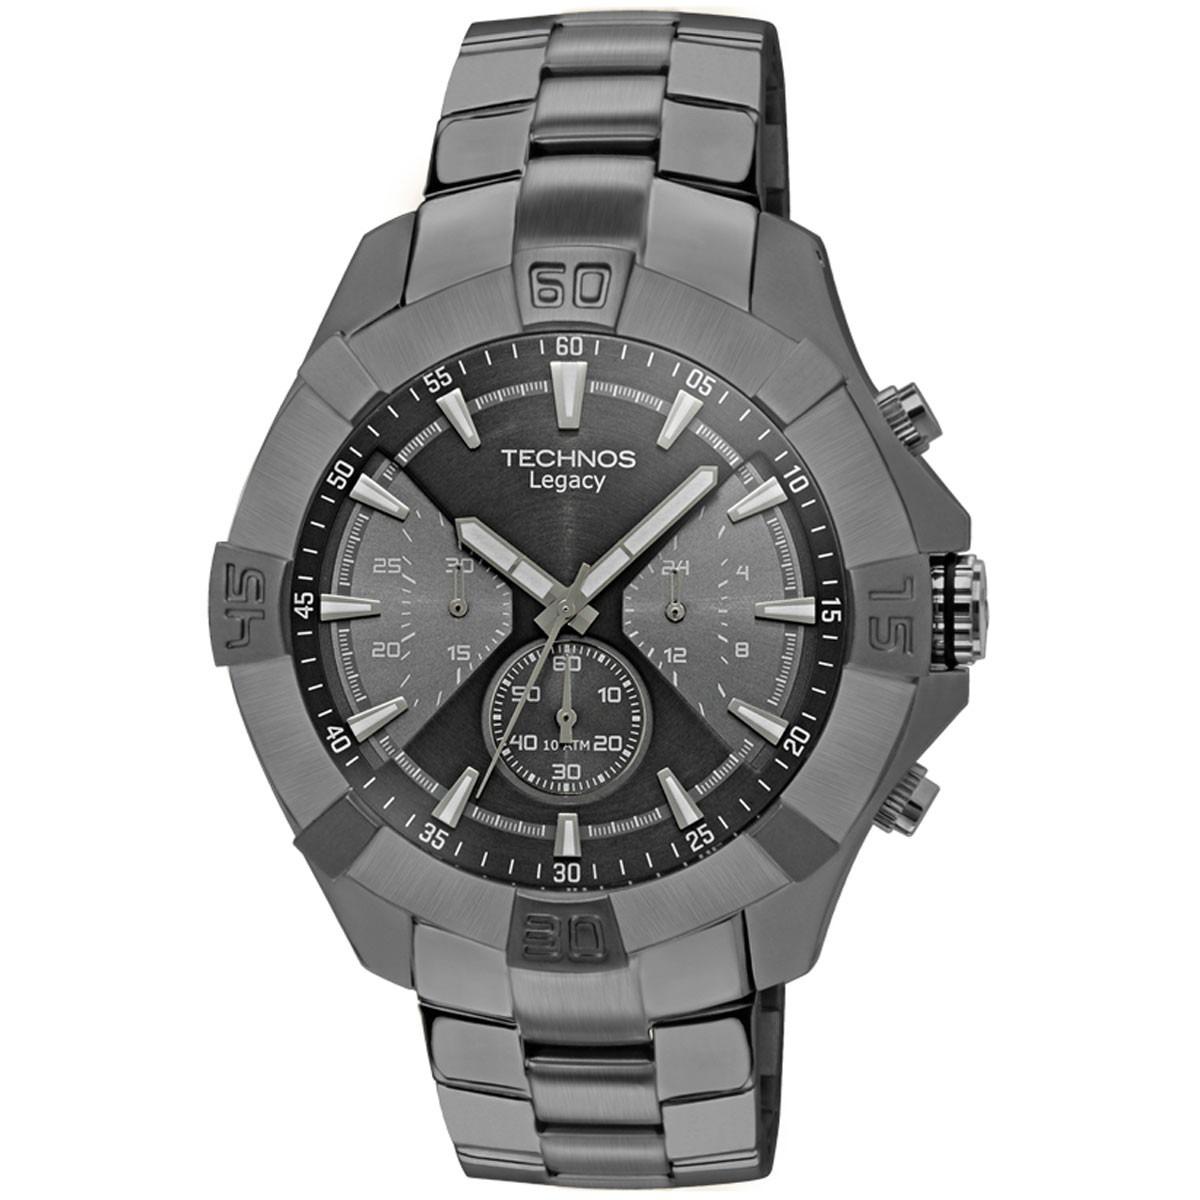 a1590668f126d relógio technos masculino legacy js20af 1c preto oferta. Carregando zoom.